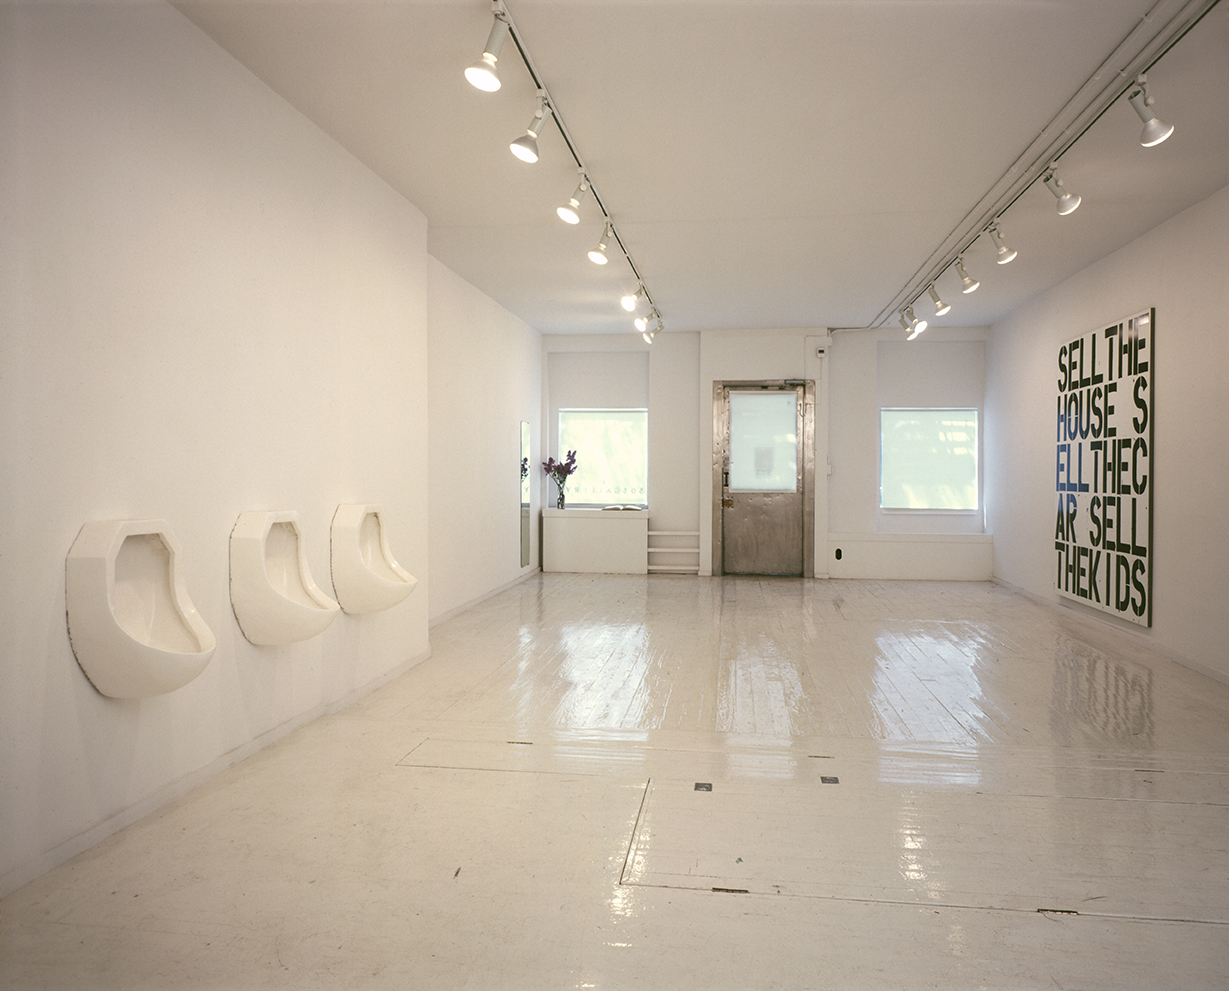 303 Gallery, 1988 Robert Gober & Christopher Wool